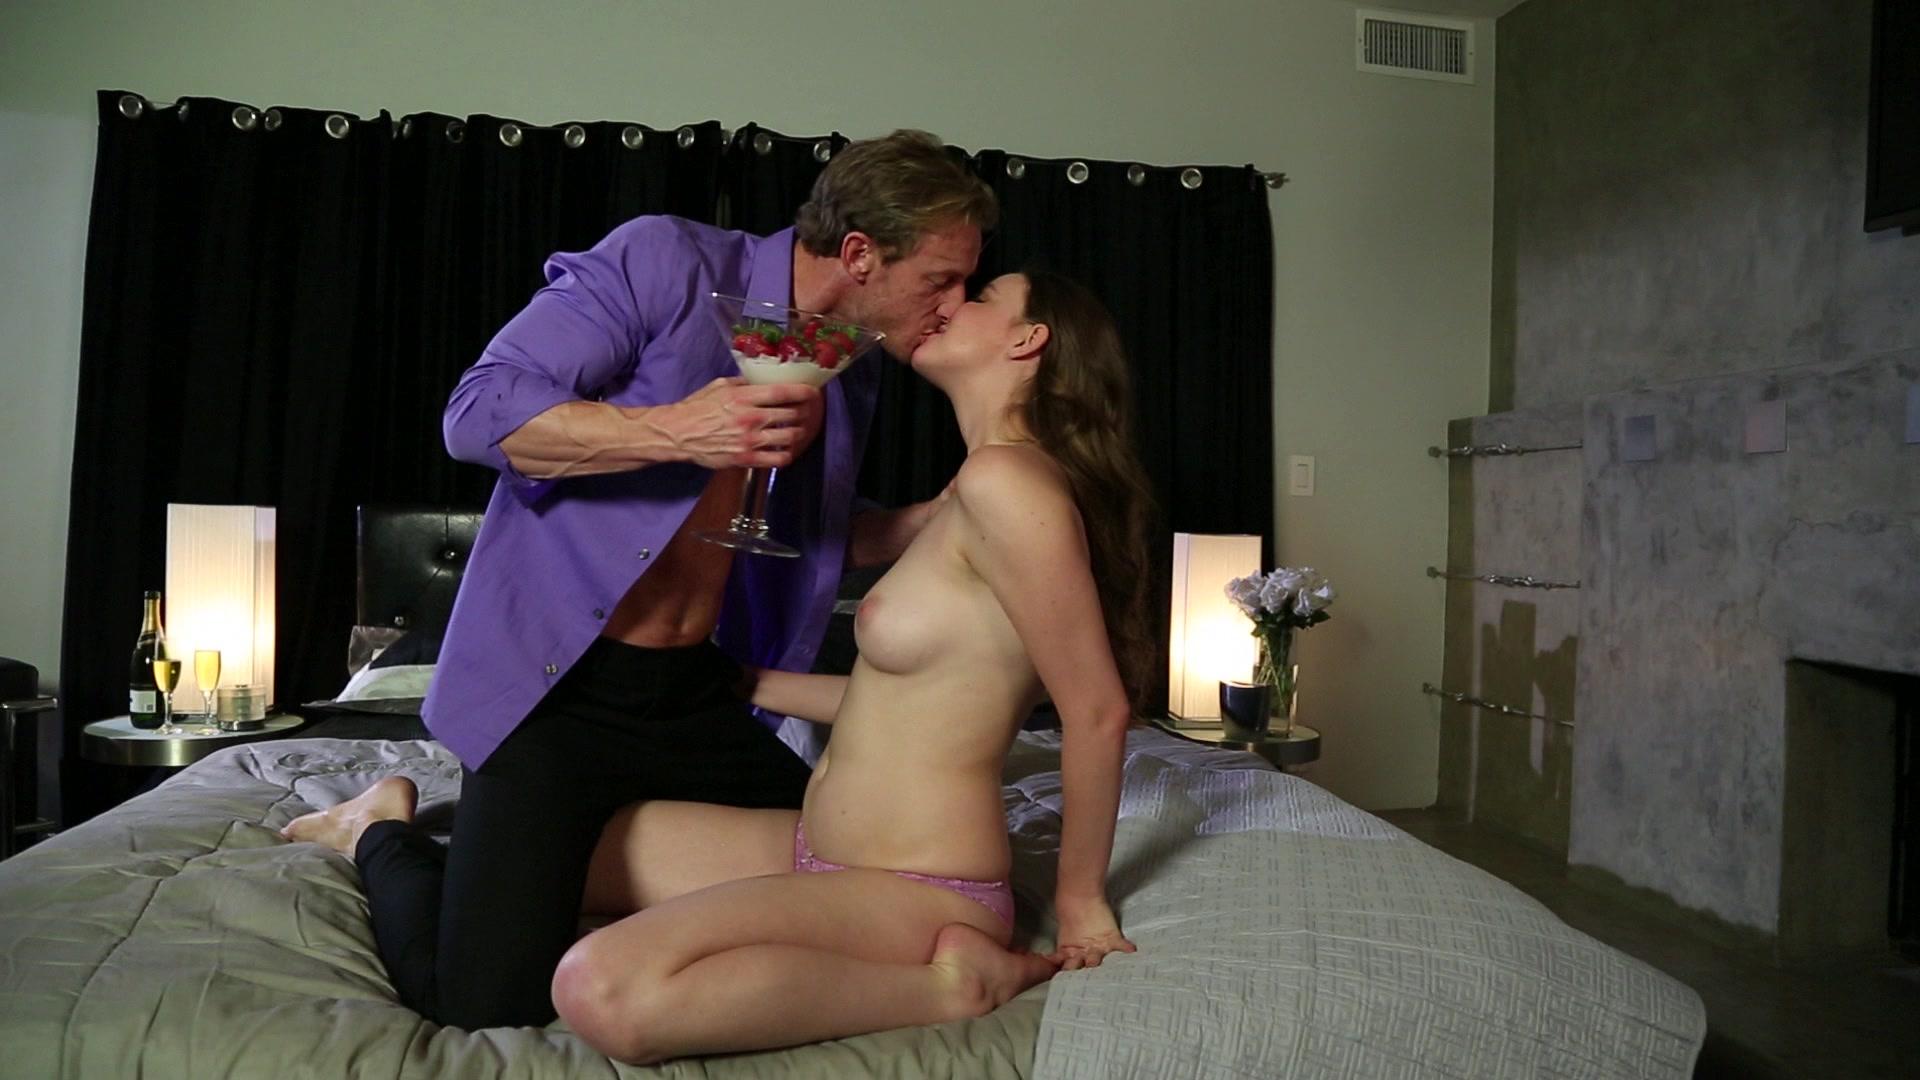 kama sutra sex guide